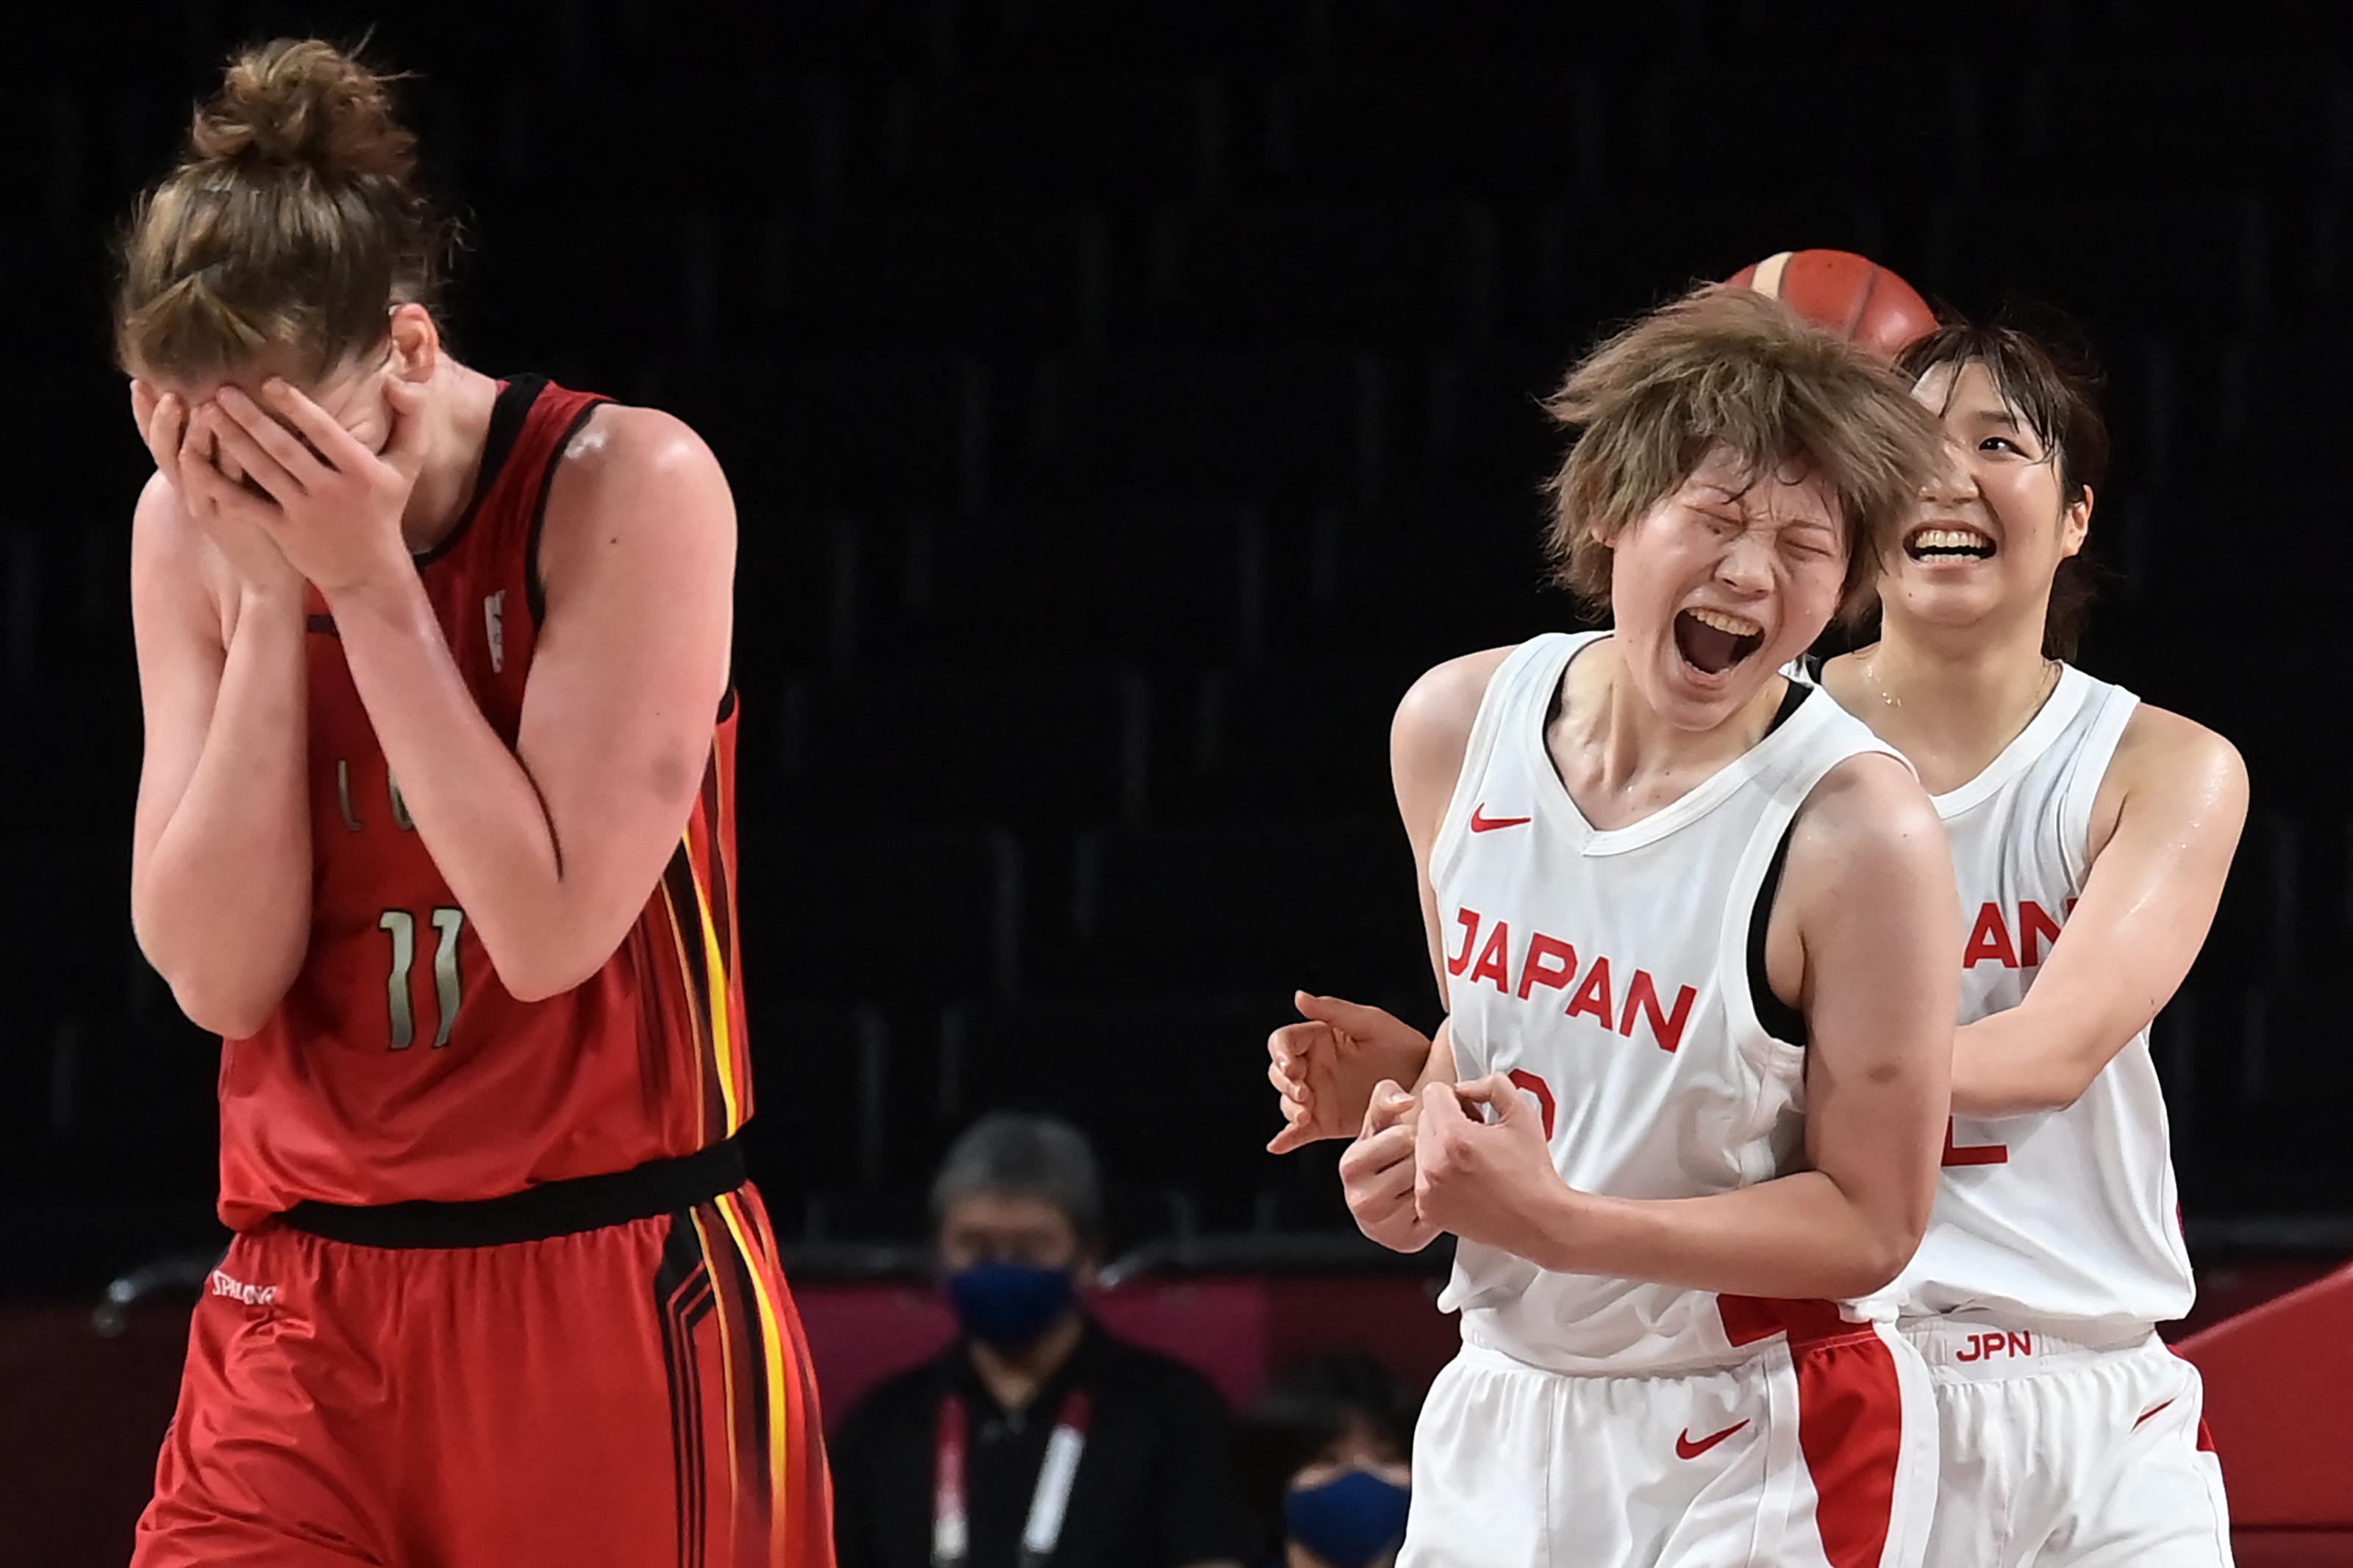 TOPSHOT-BASKETBALL-OLY-2020-2021-TOKYO-JPN-BEL